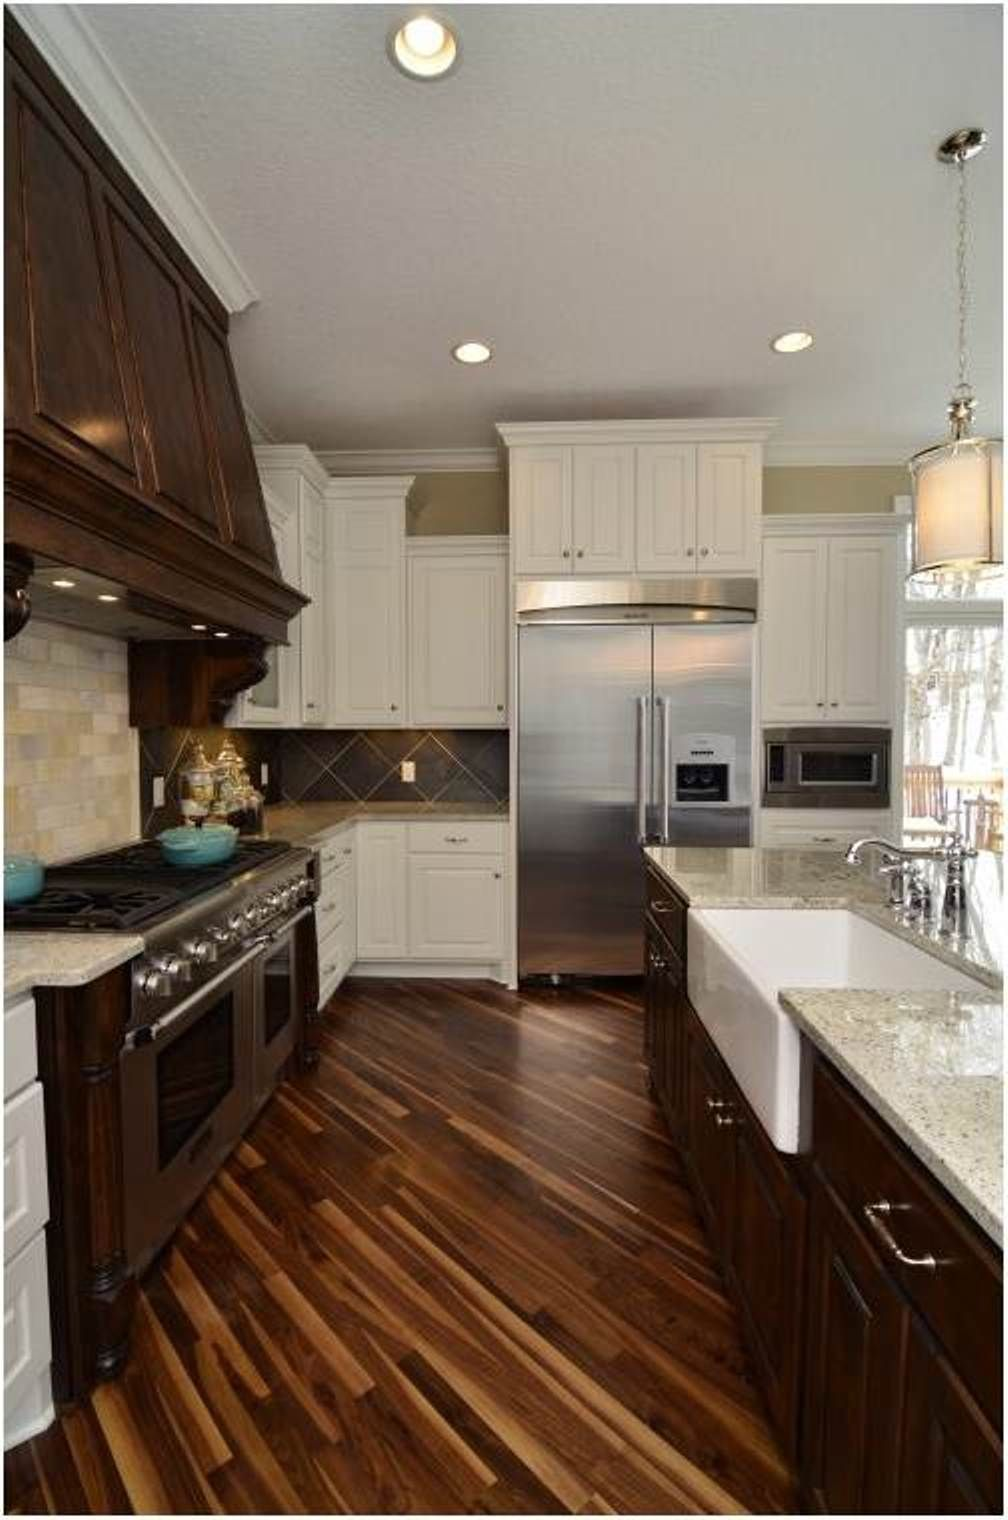 Different Types of Flooring for Kitchen Hardwood floors